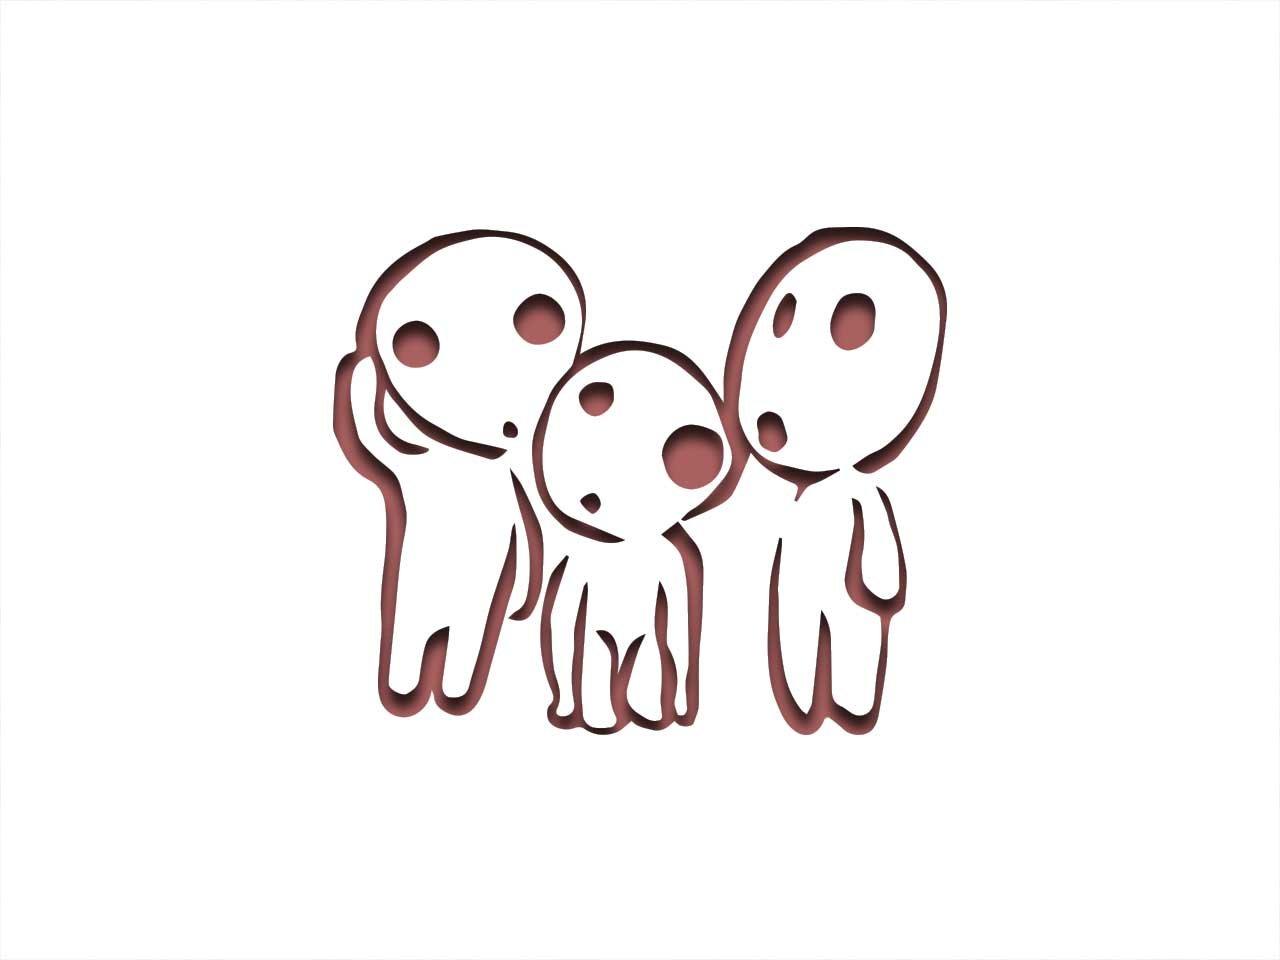 Kodama Ghibli Inspired Stencil - 12' x 8' - 190Mu Mylar A, Airbrushing, Craft, Grafitti ST-ML-AN-00010 Apex Laser ltd